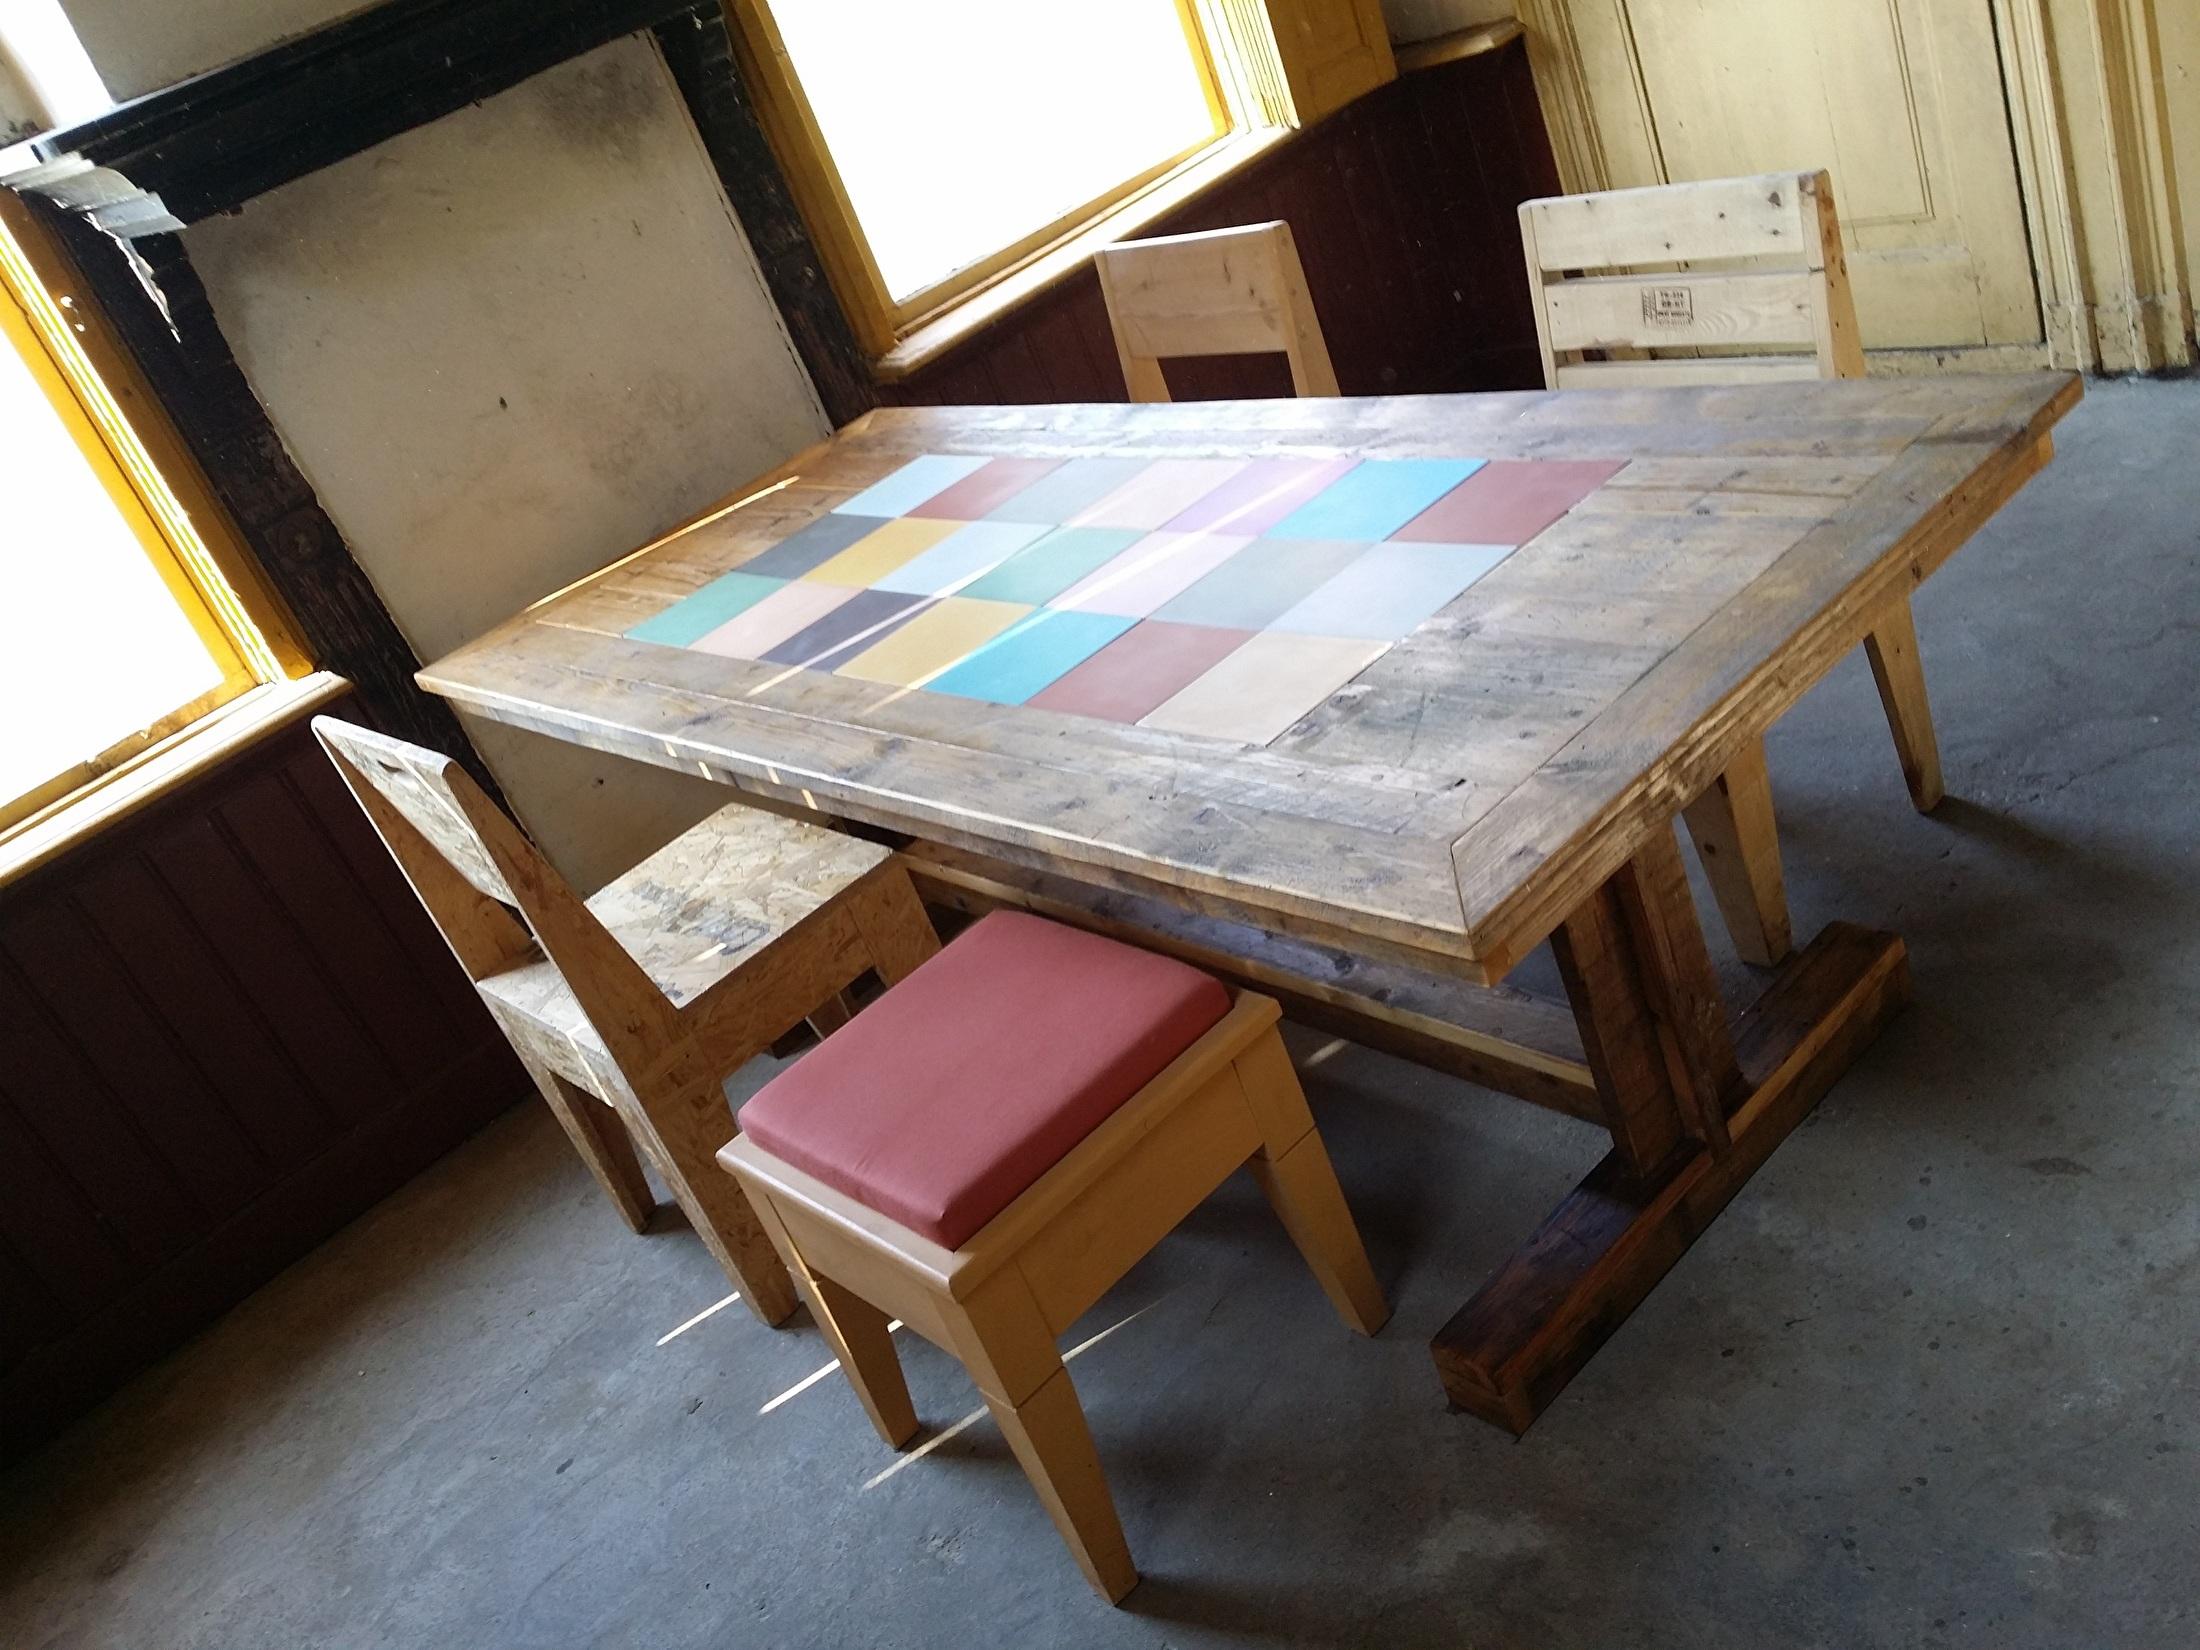 Boeren Bankje Van Steigerhout.Tafels Met Portugese Cementtegels The Woodcrafter